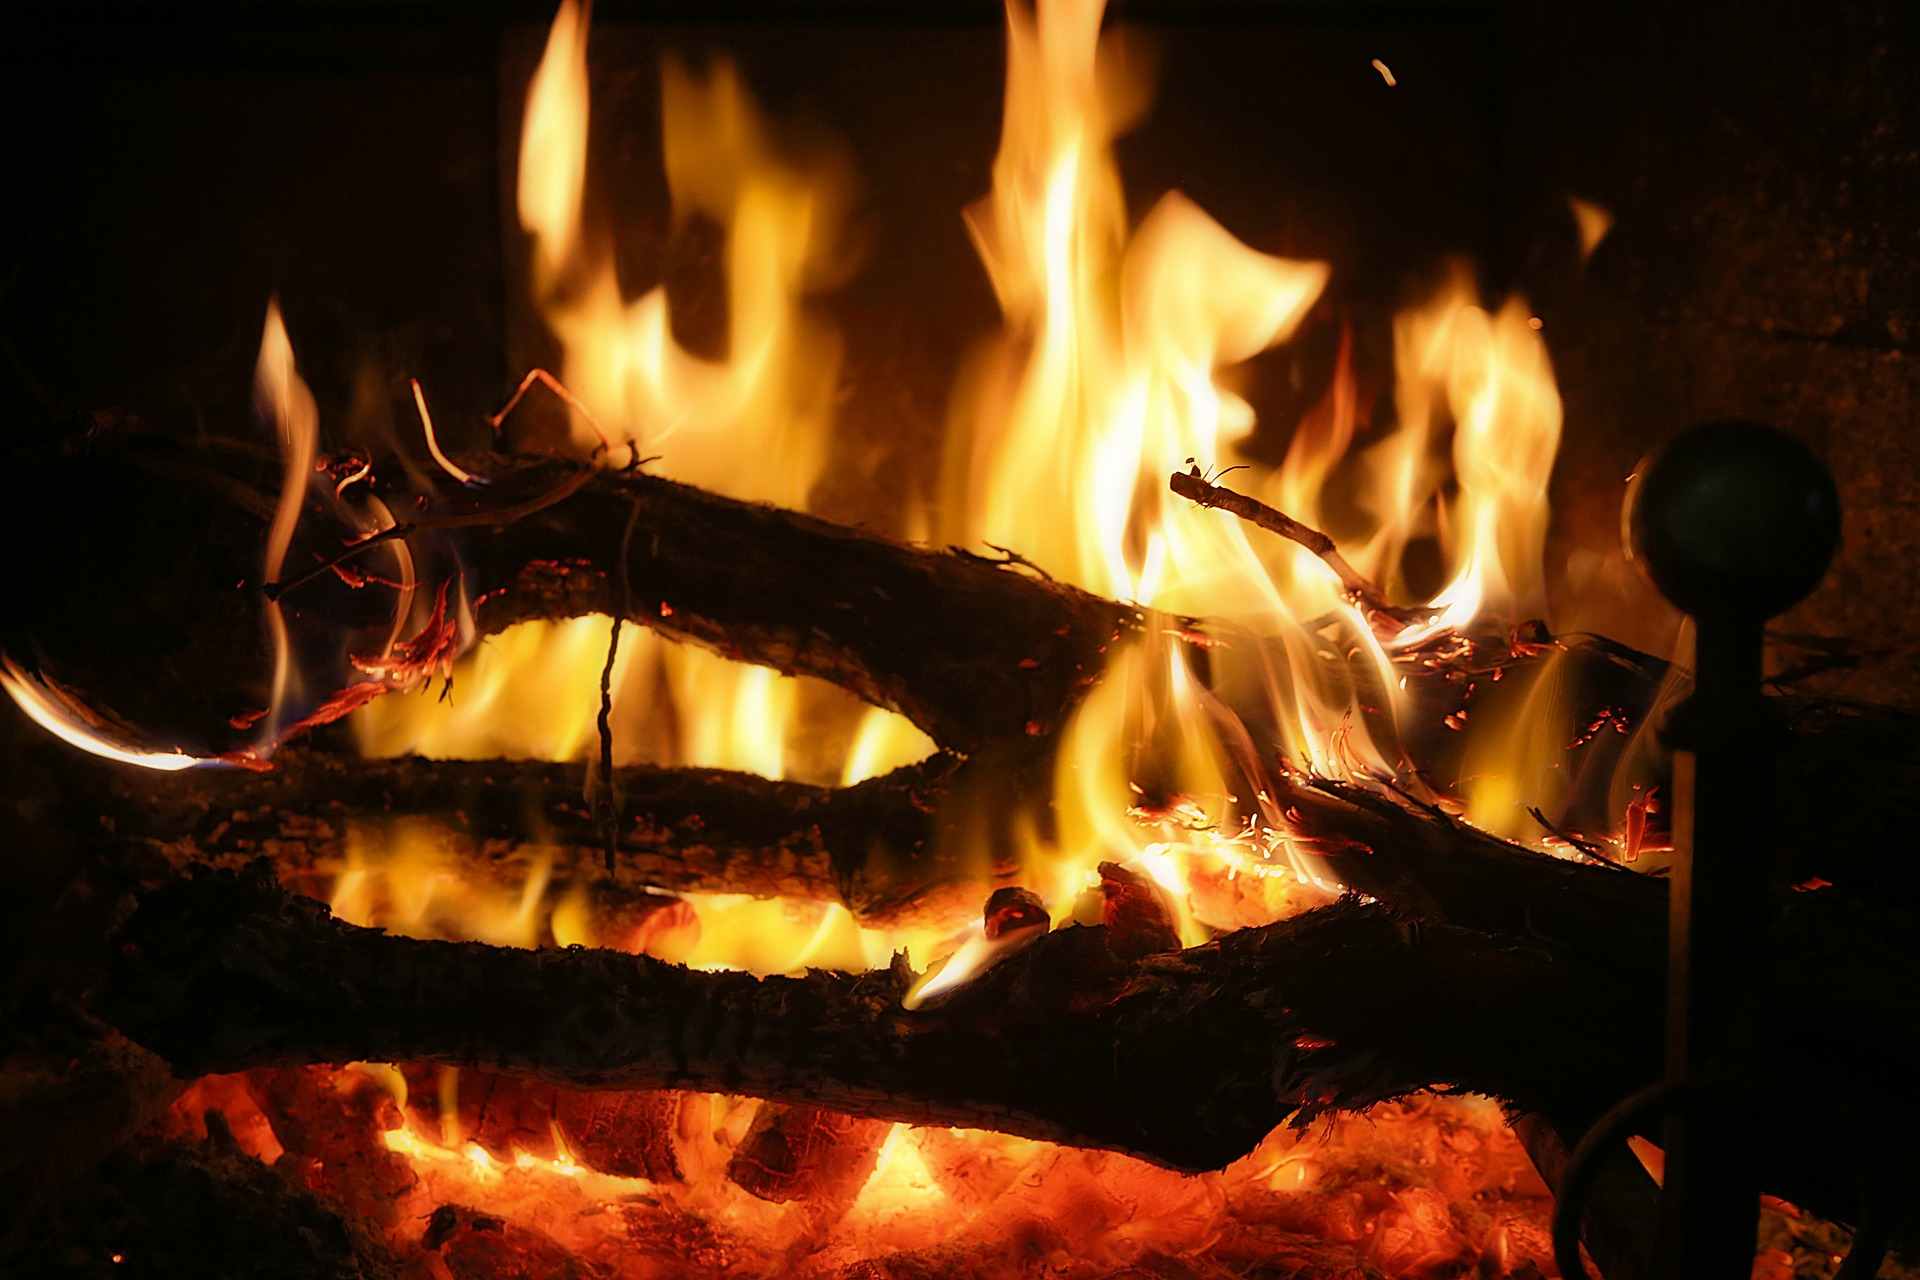 How hot does wood burn?